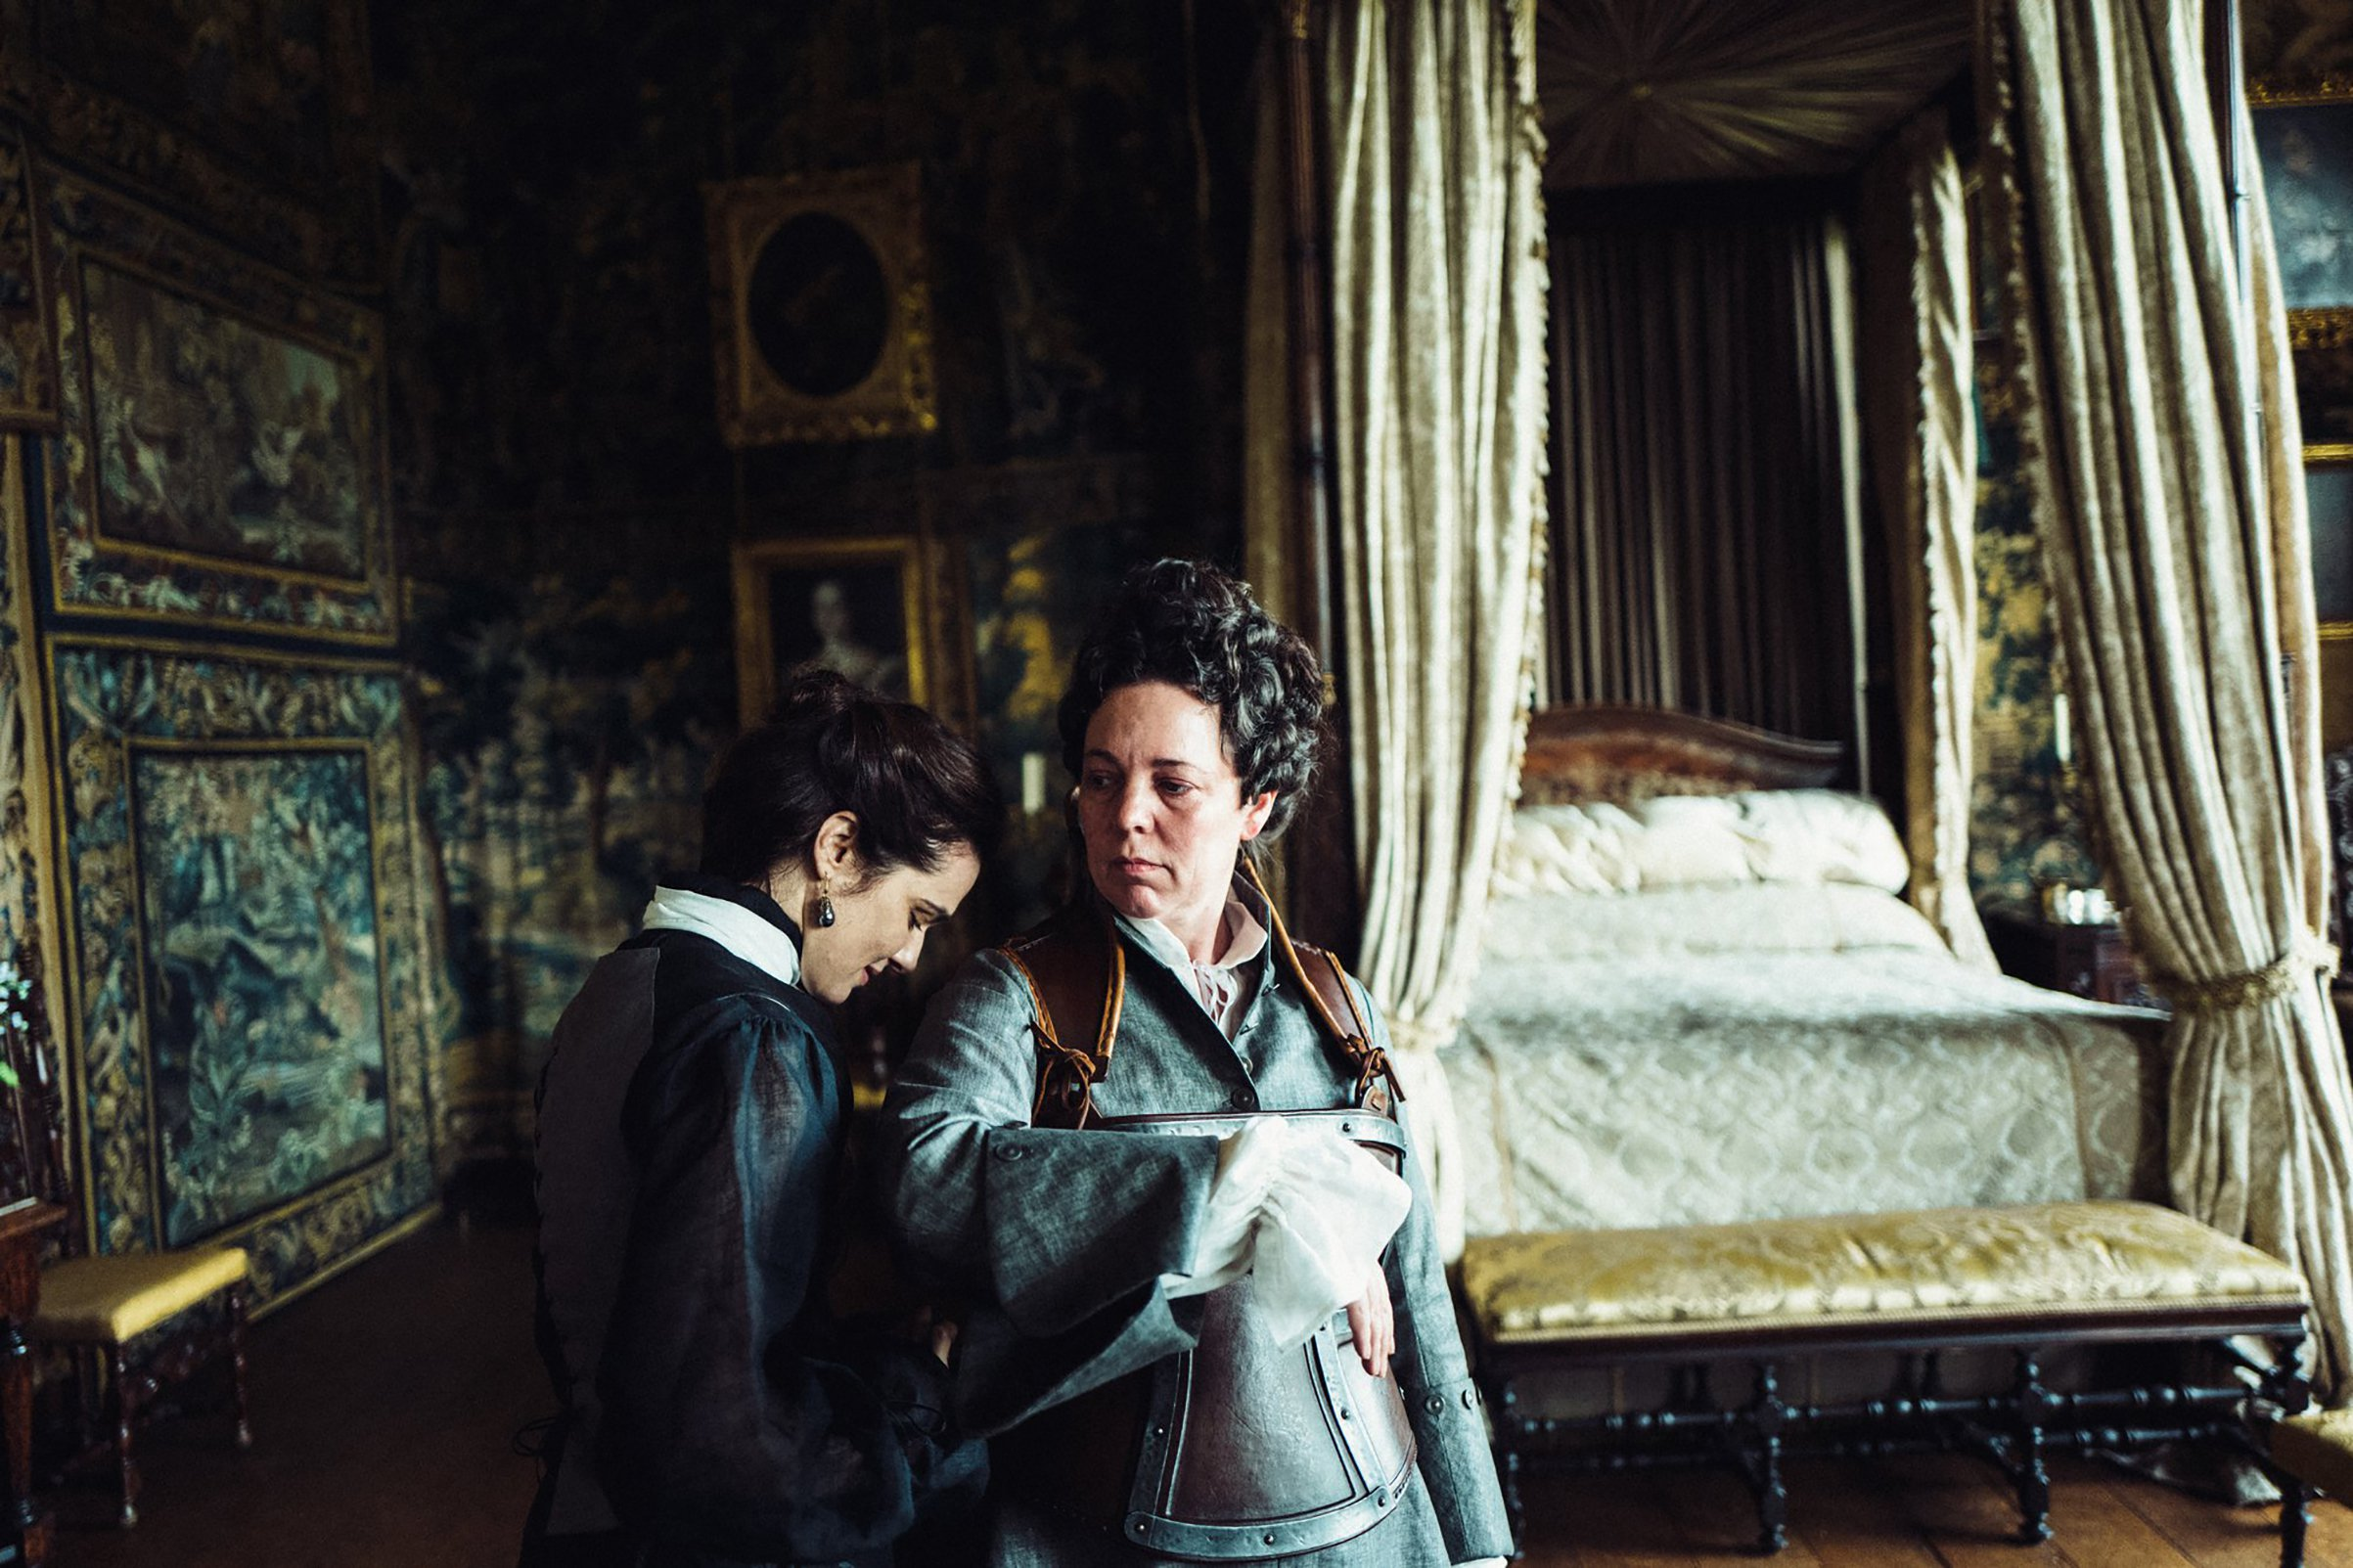 Rachel Weisz and Olivia Colman Yorgos Lanthimos / 20th Century Fox